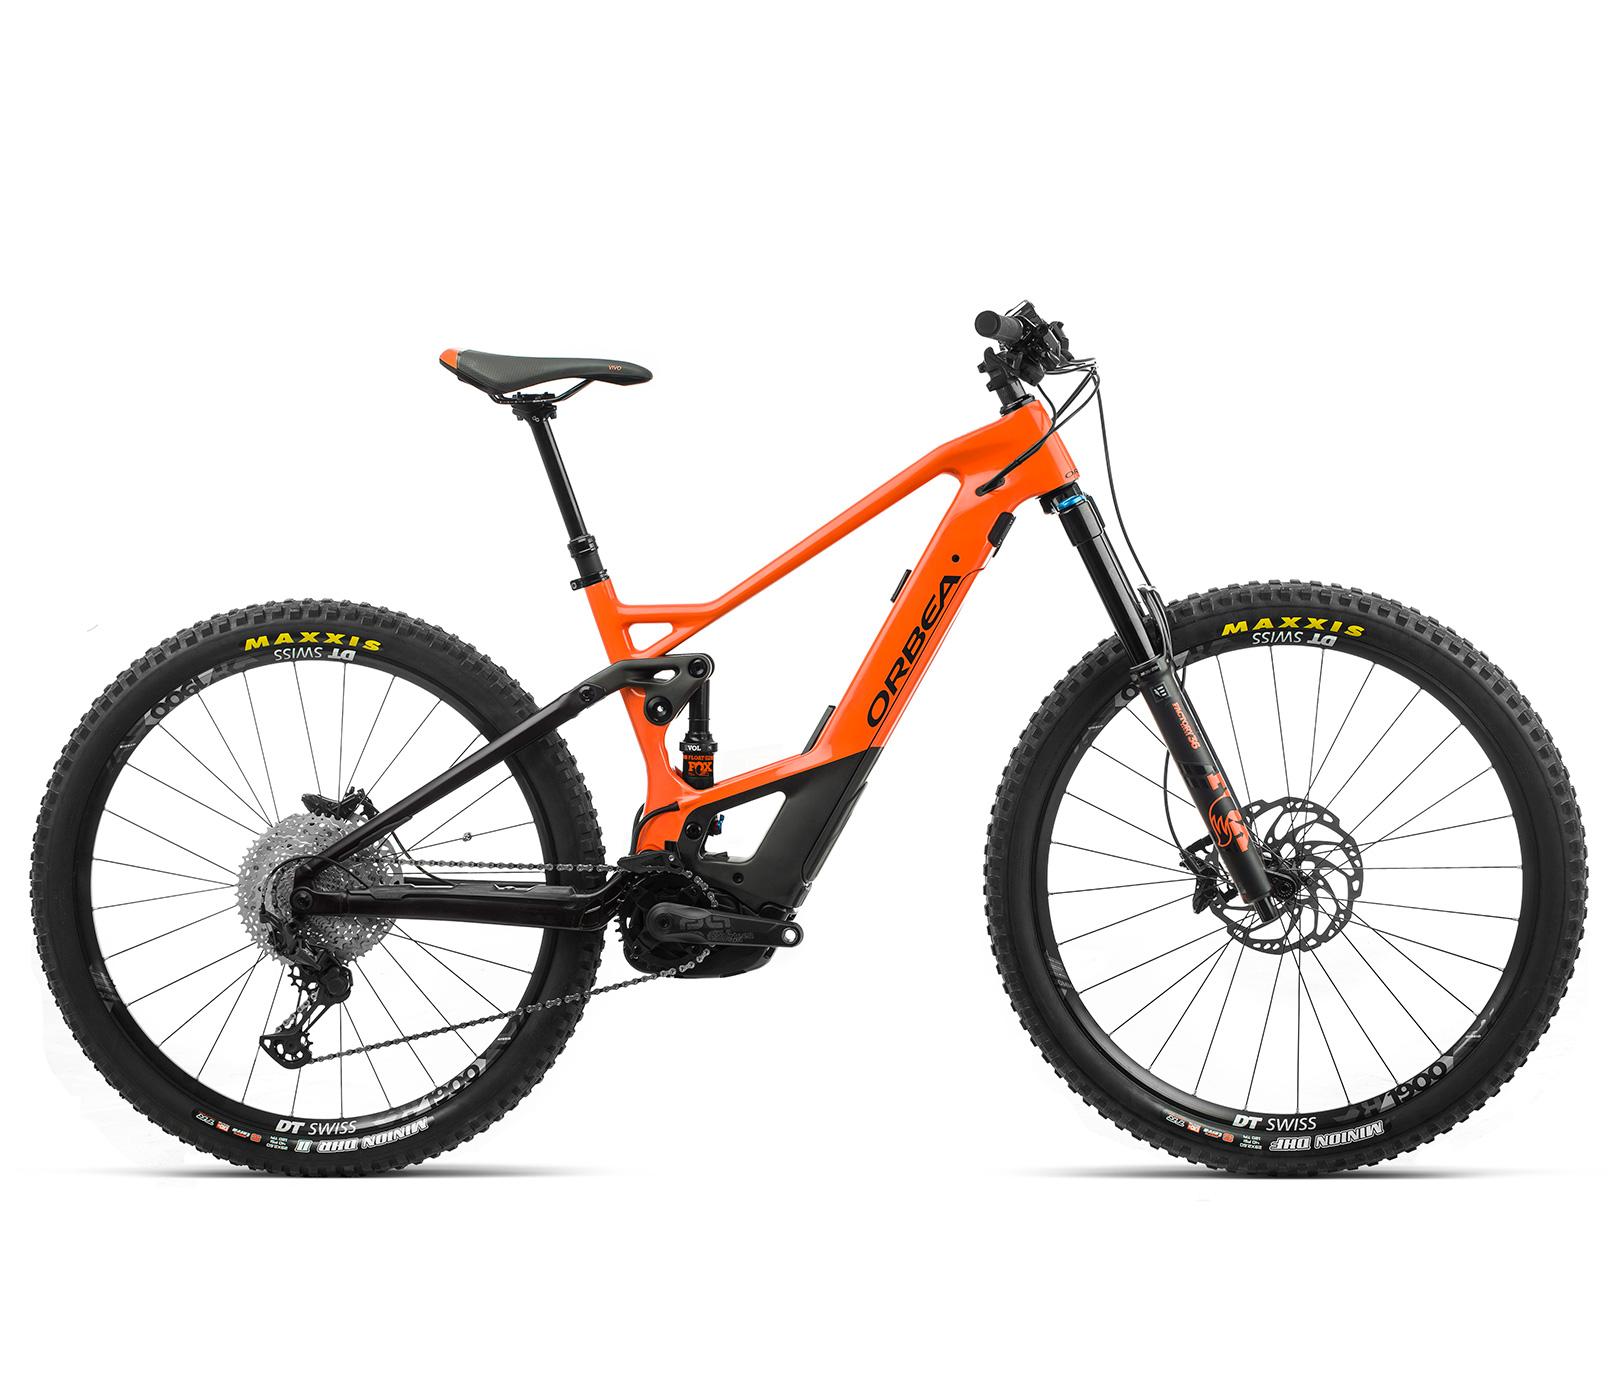 ORBEA WILD FS M20 ebike - ORANJE (GLOSS) / ZWART (DOF) @G-Bikes